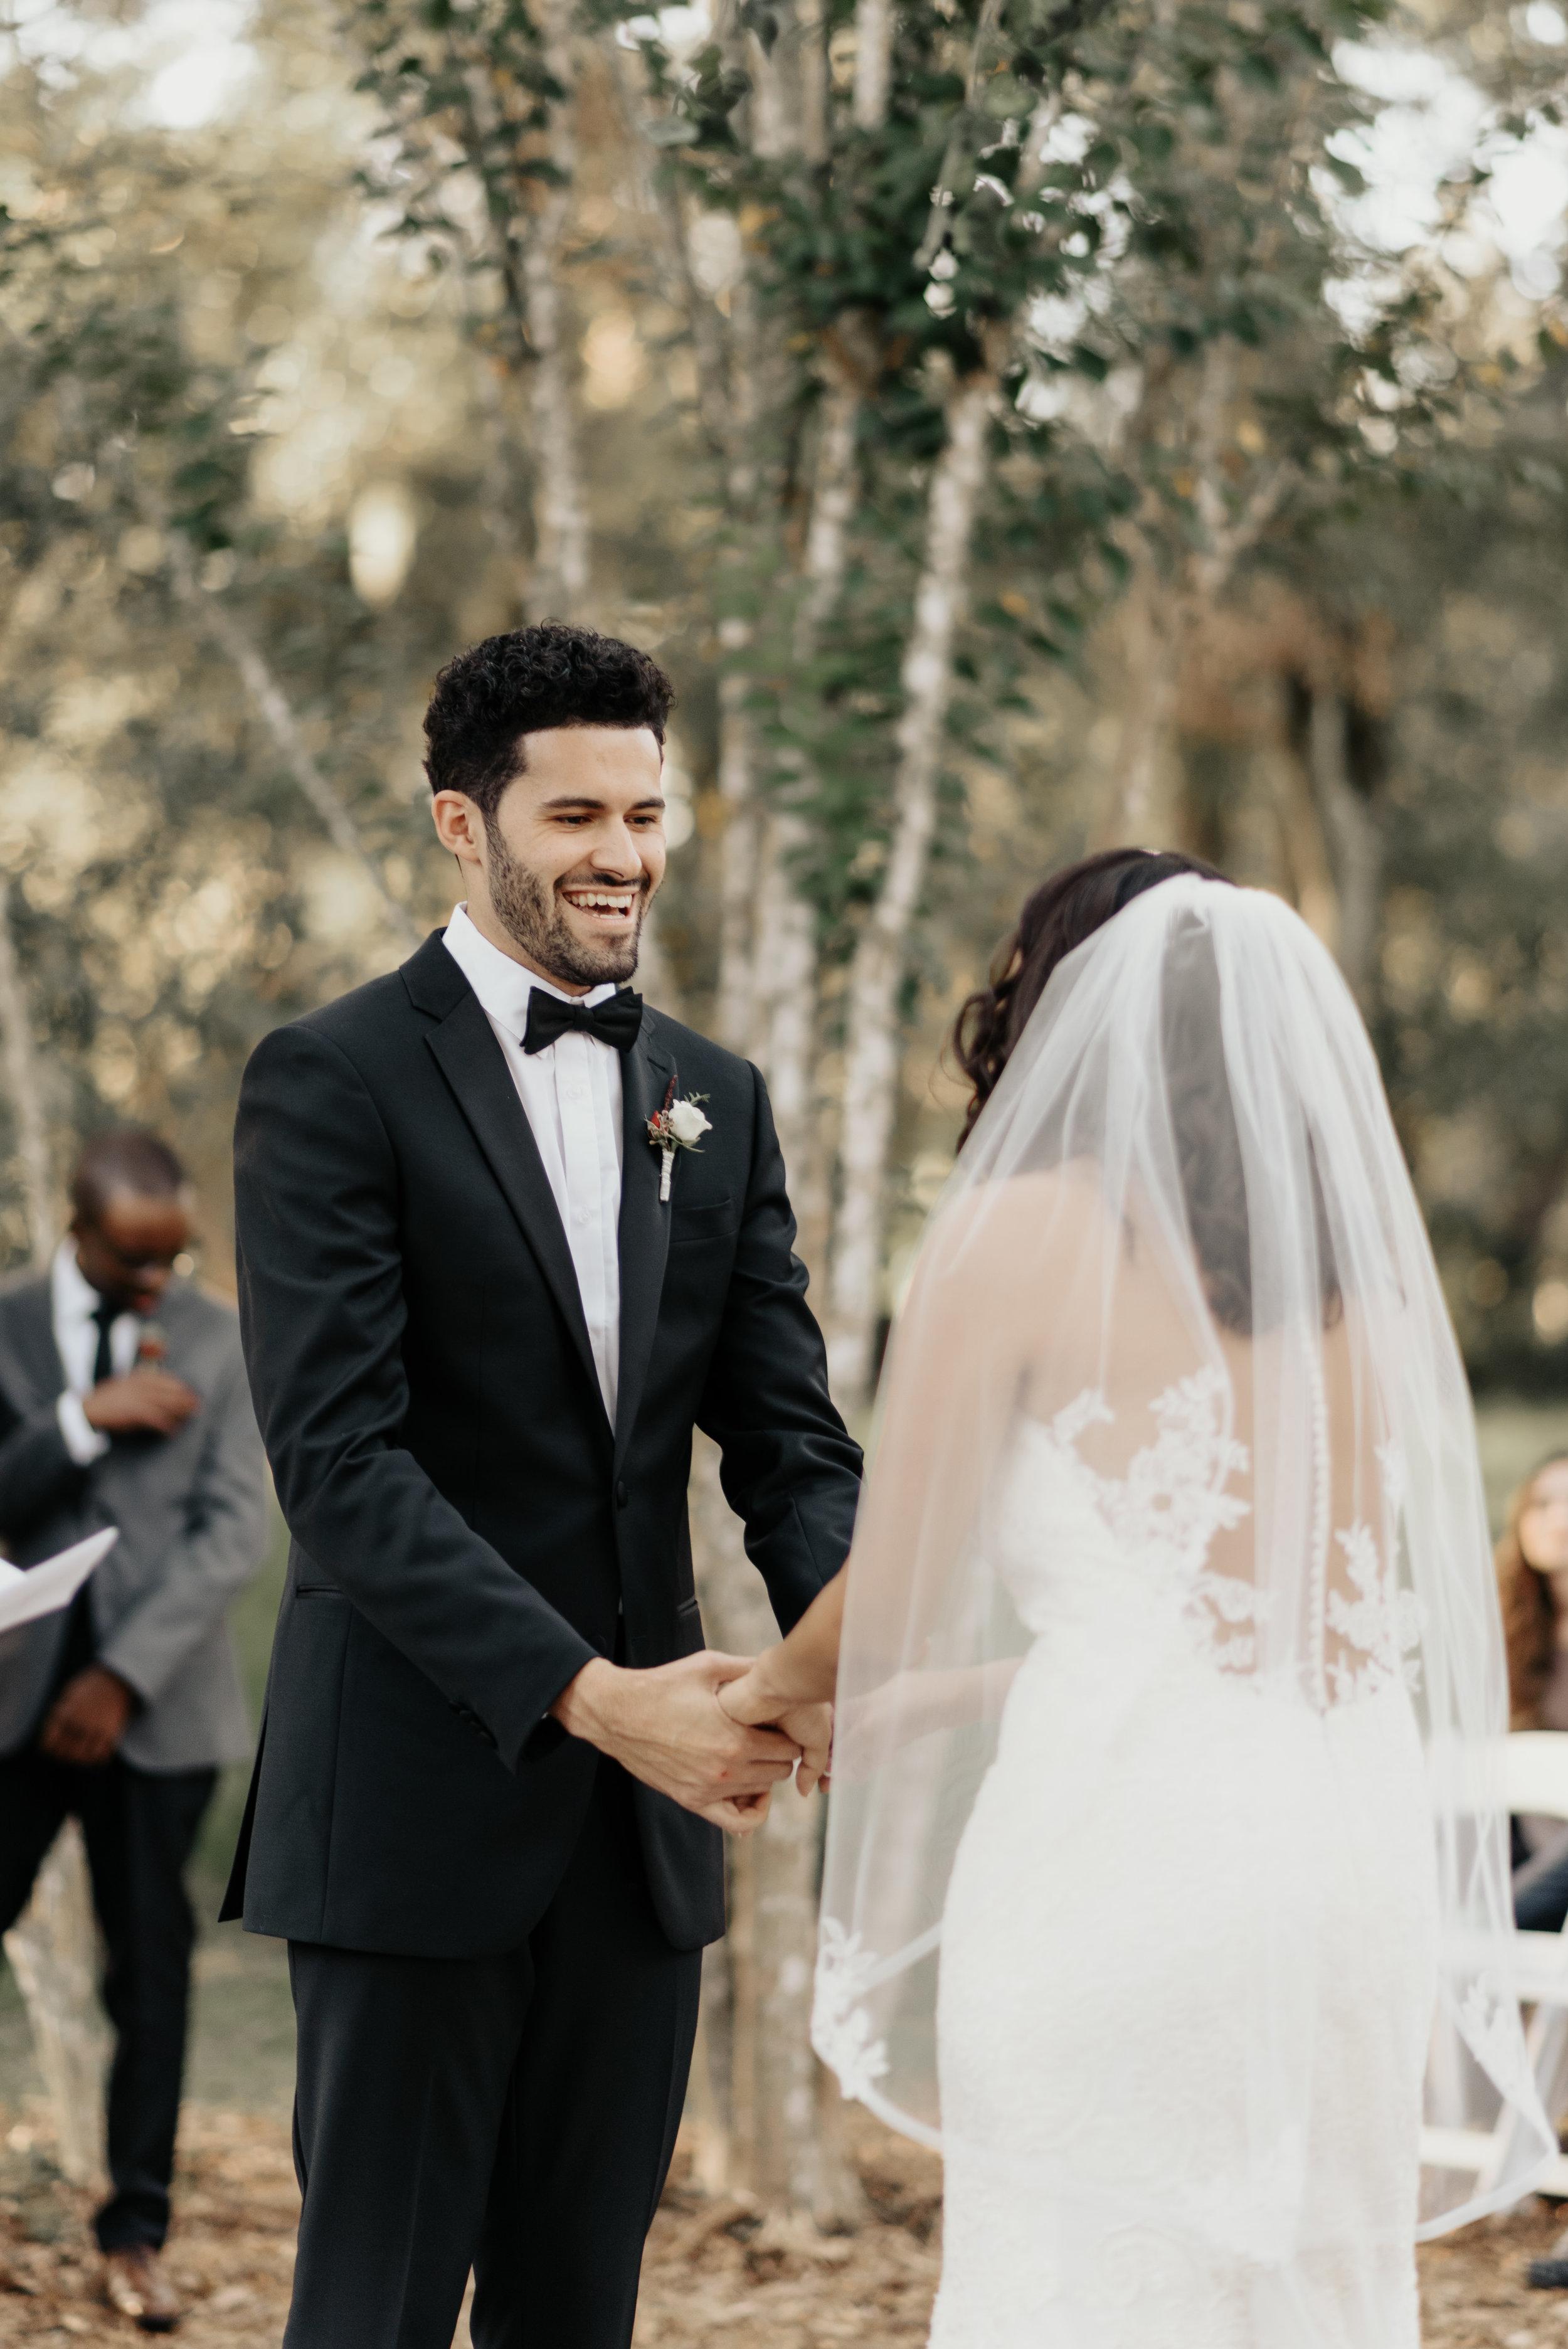 Kirstie-AJ-Wedding-0005.jpg